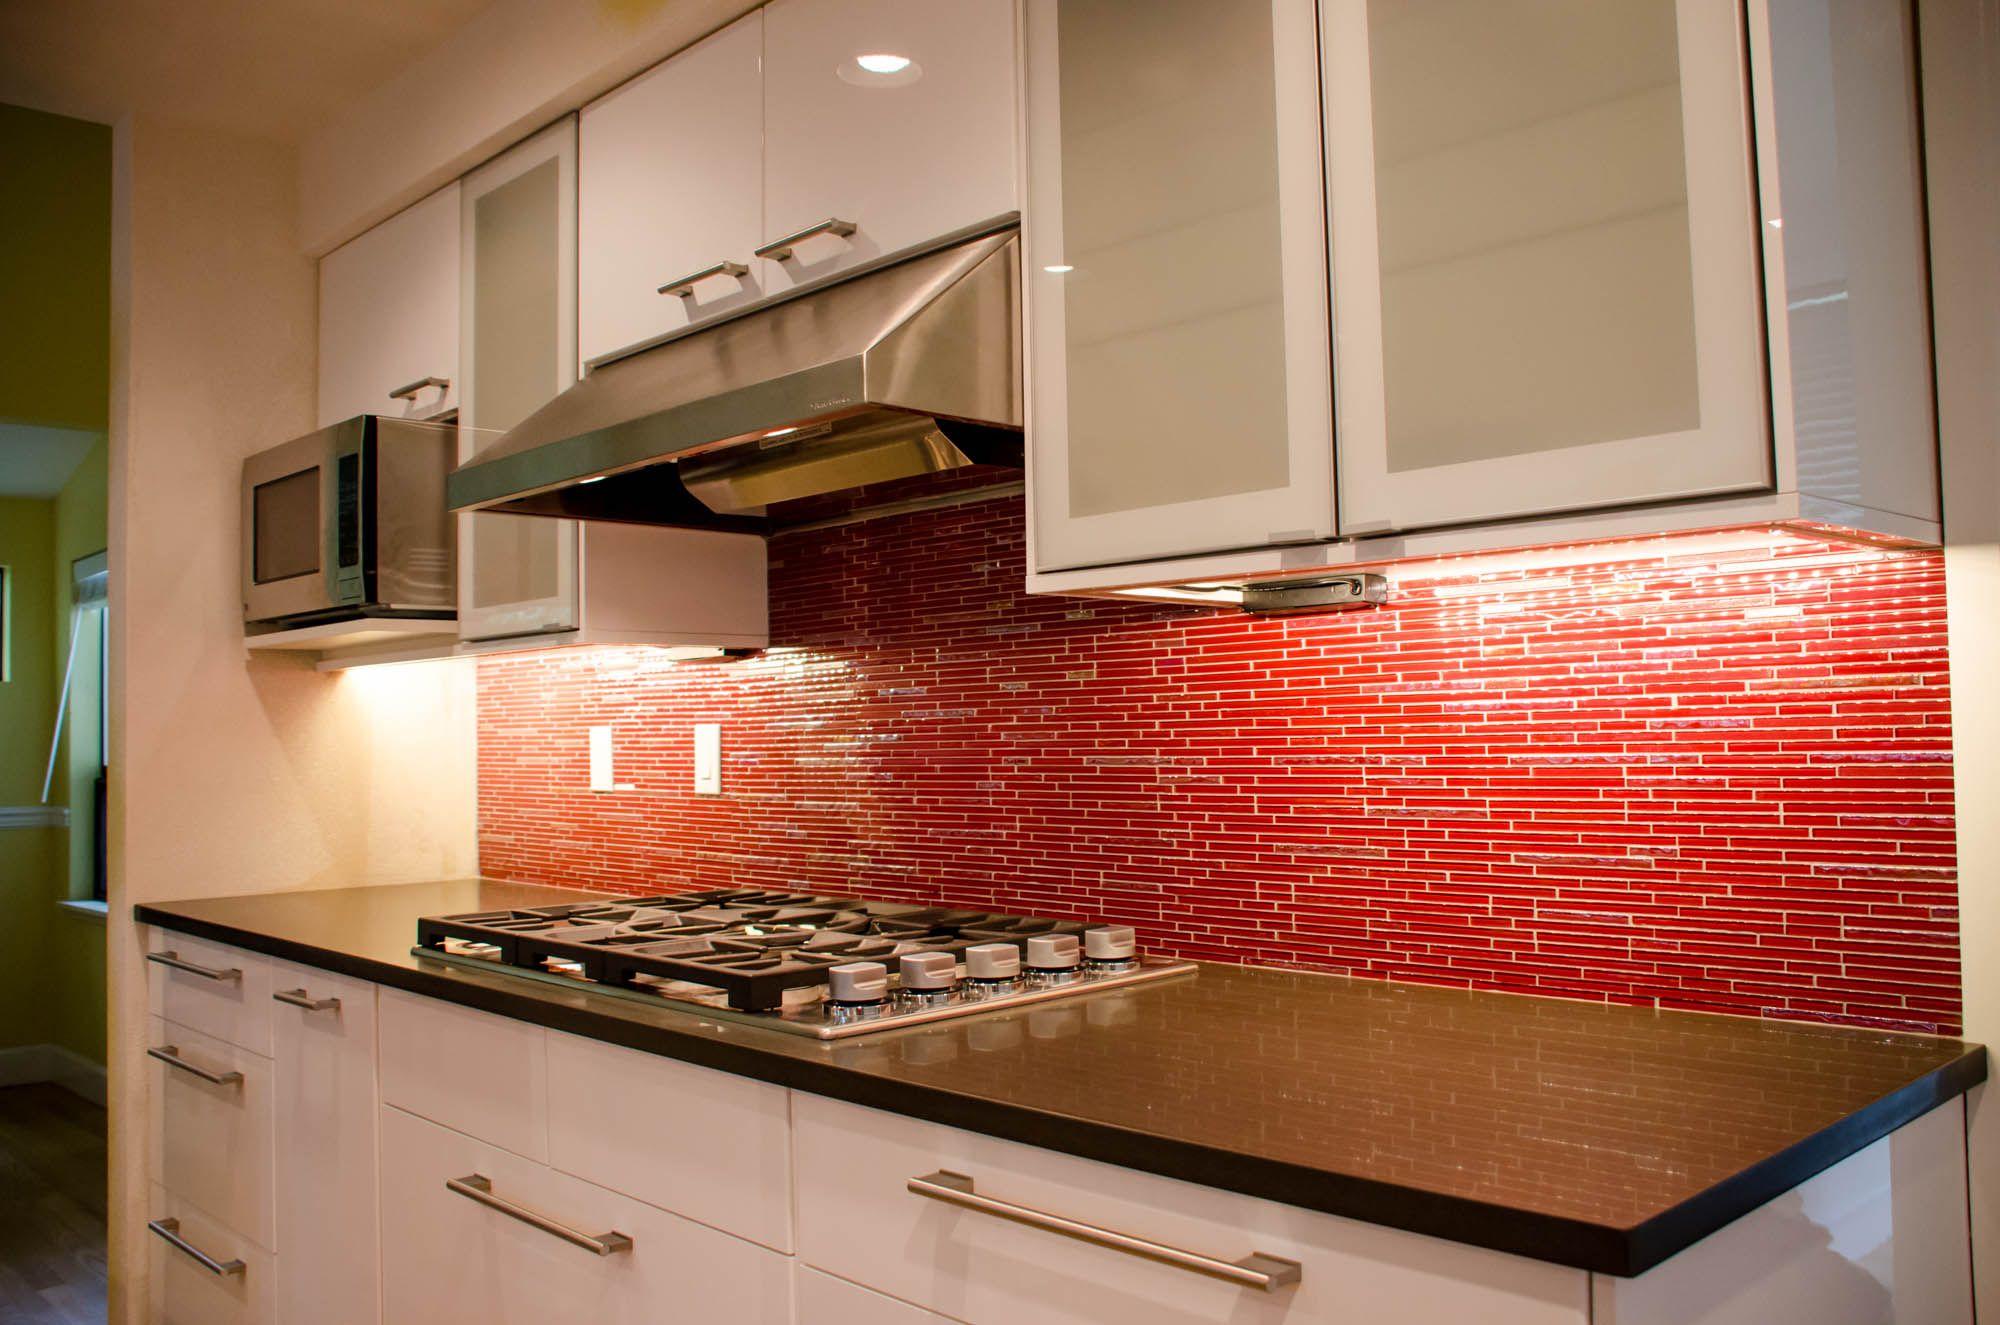 20 Inspiring Kitchen Backsplash Ideas And Pictures Modern